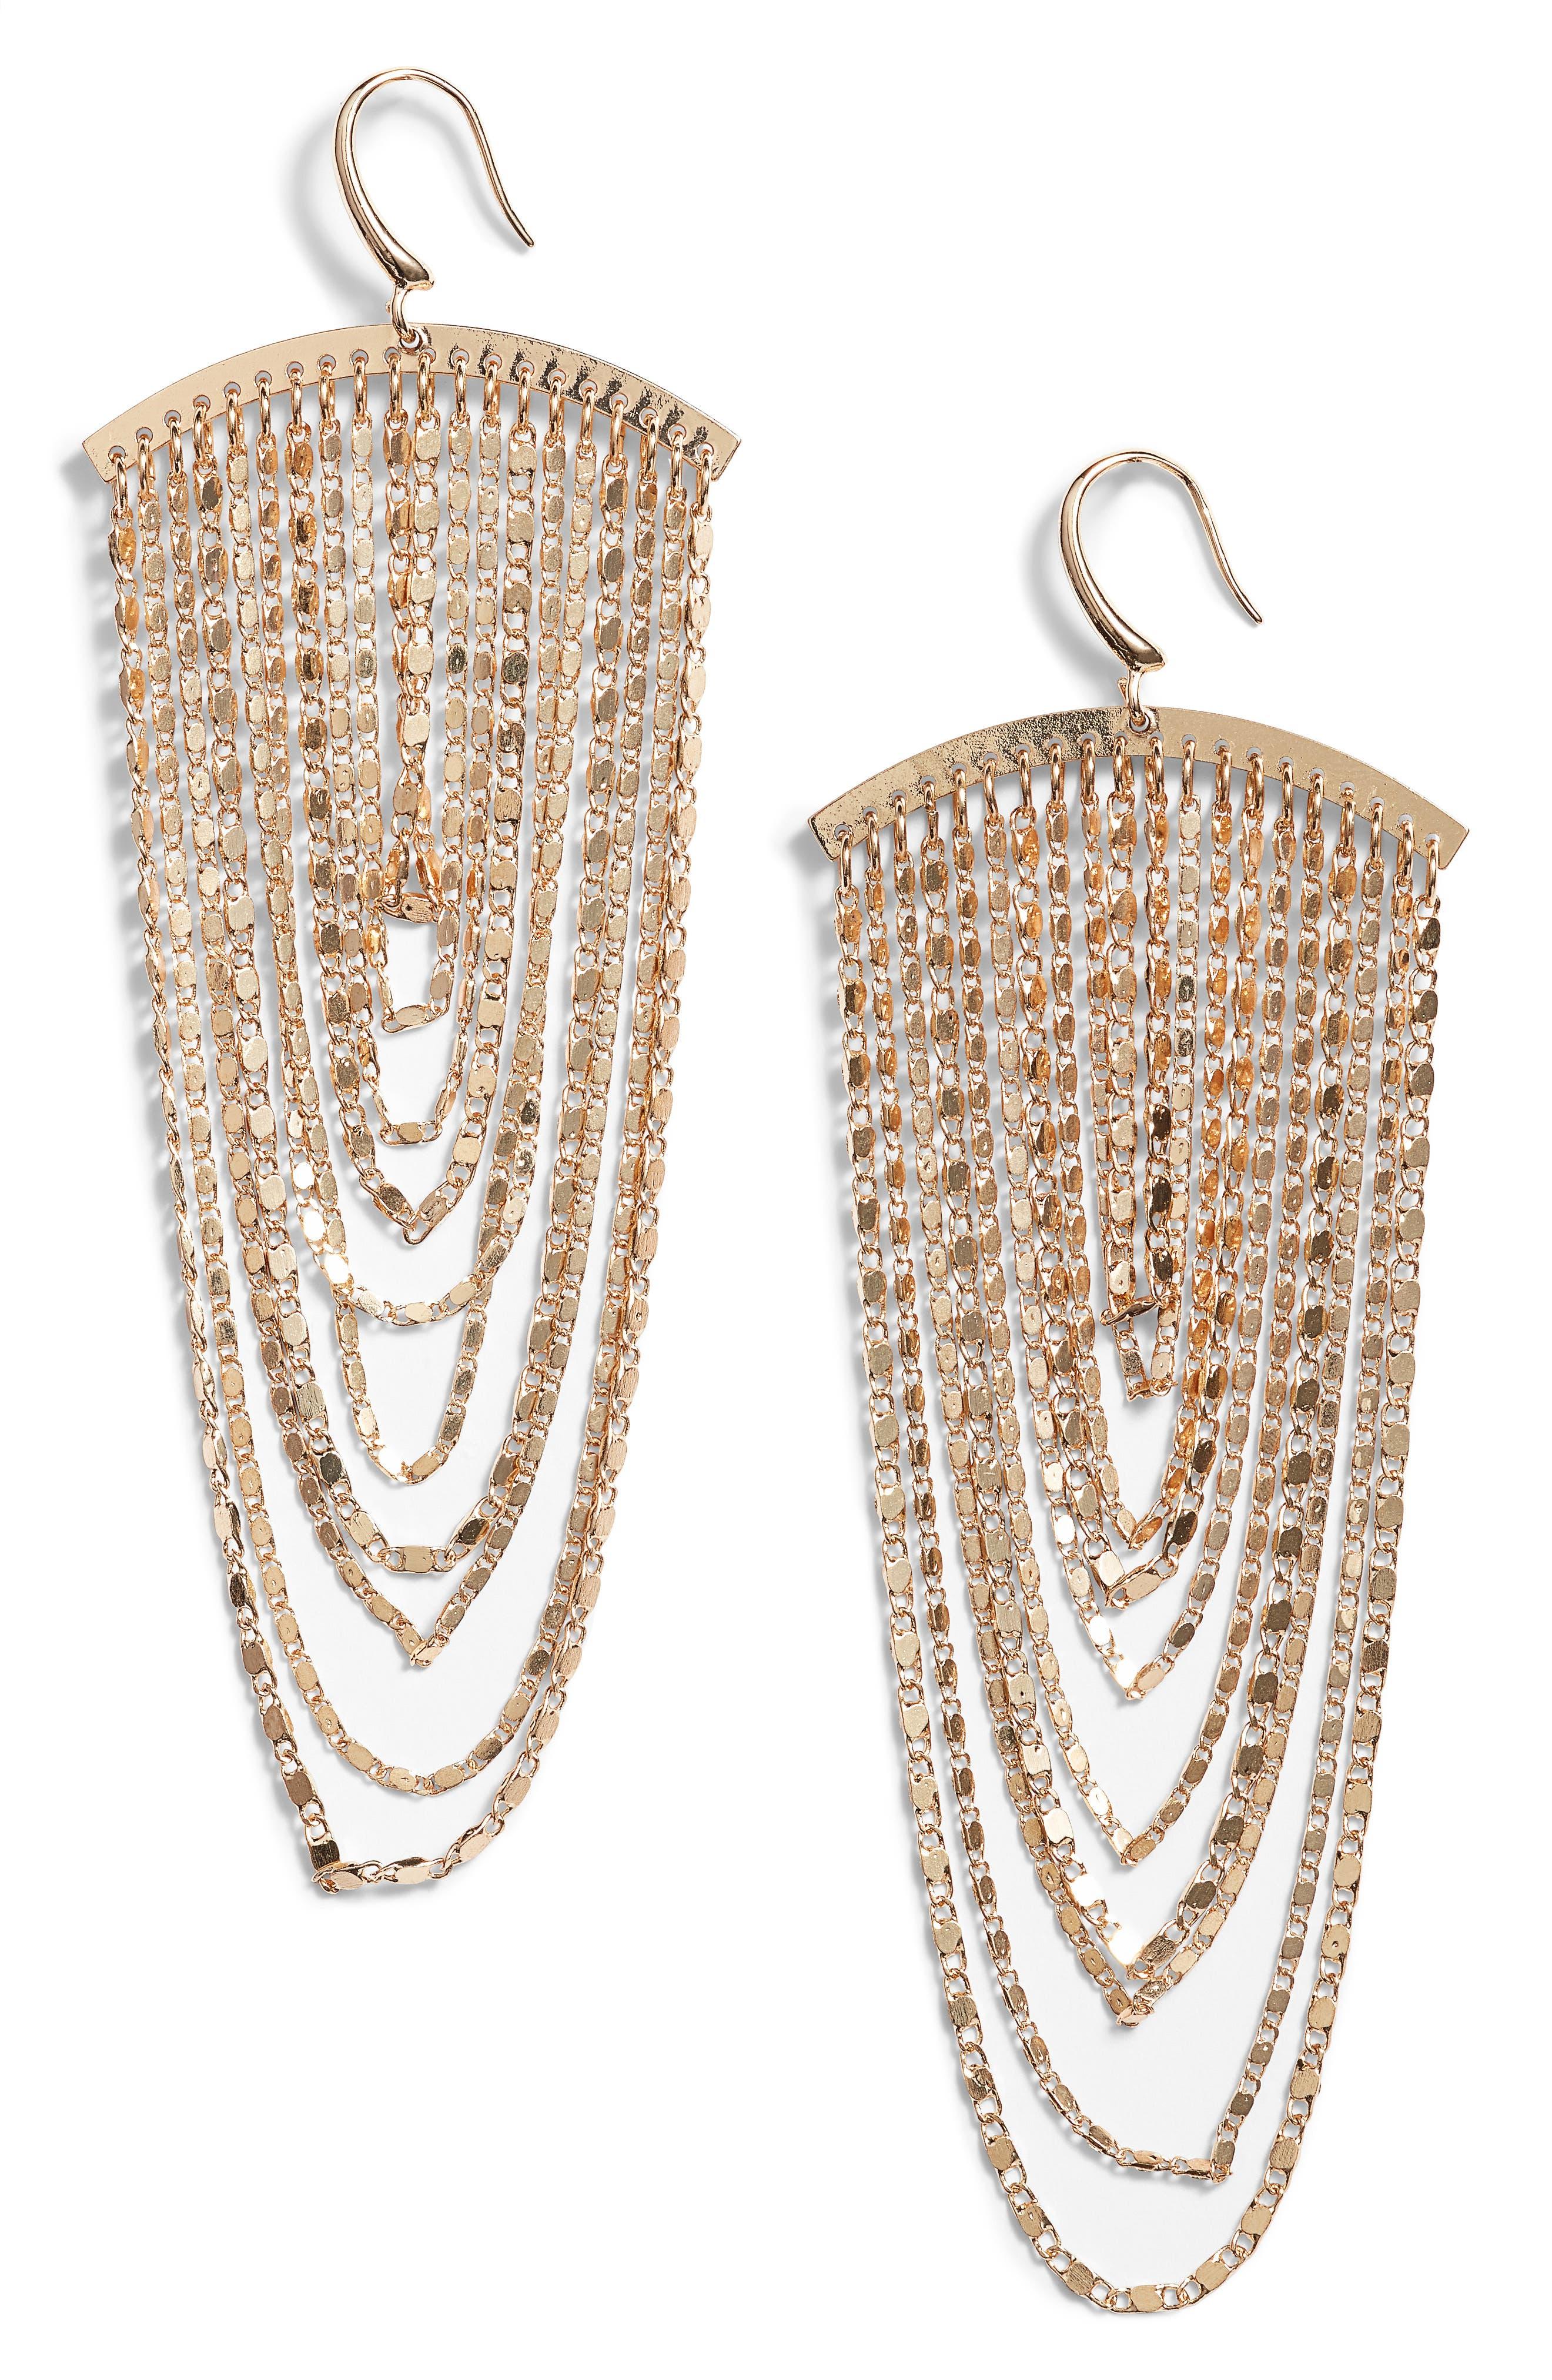 Chain Cascade Earrings,                             Main thumbnail 1, color,                             710